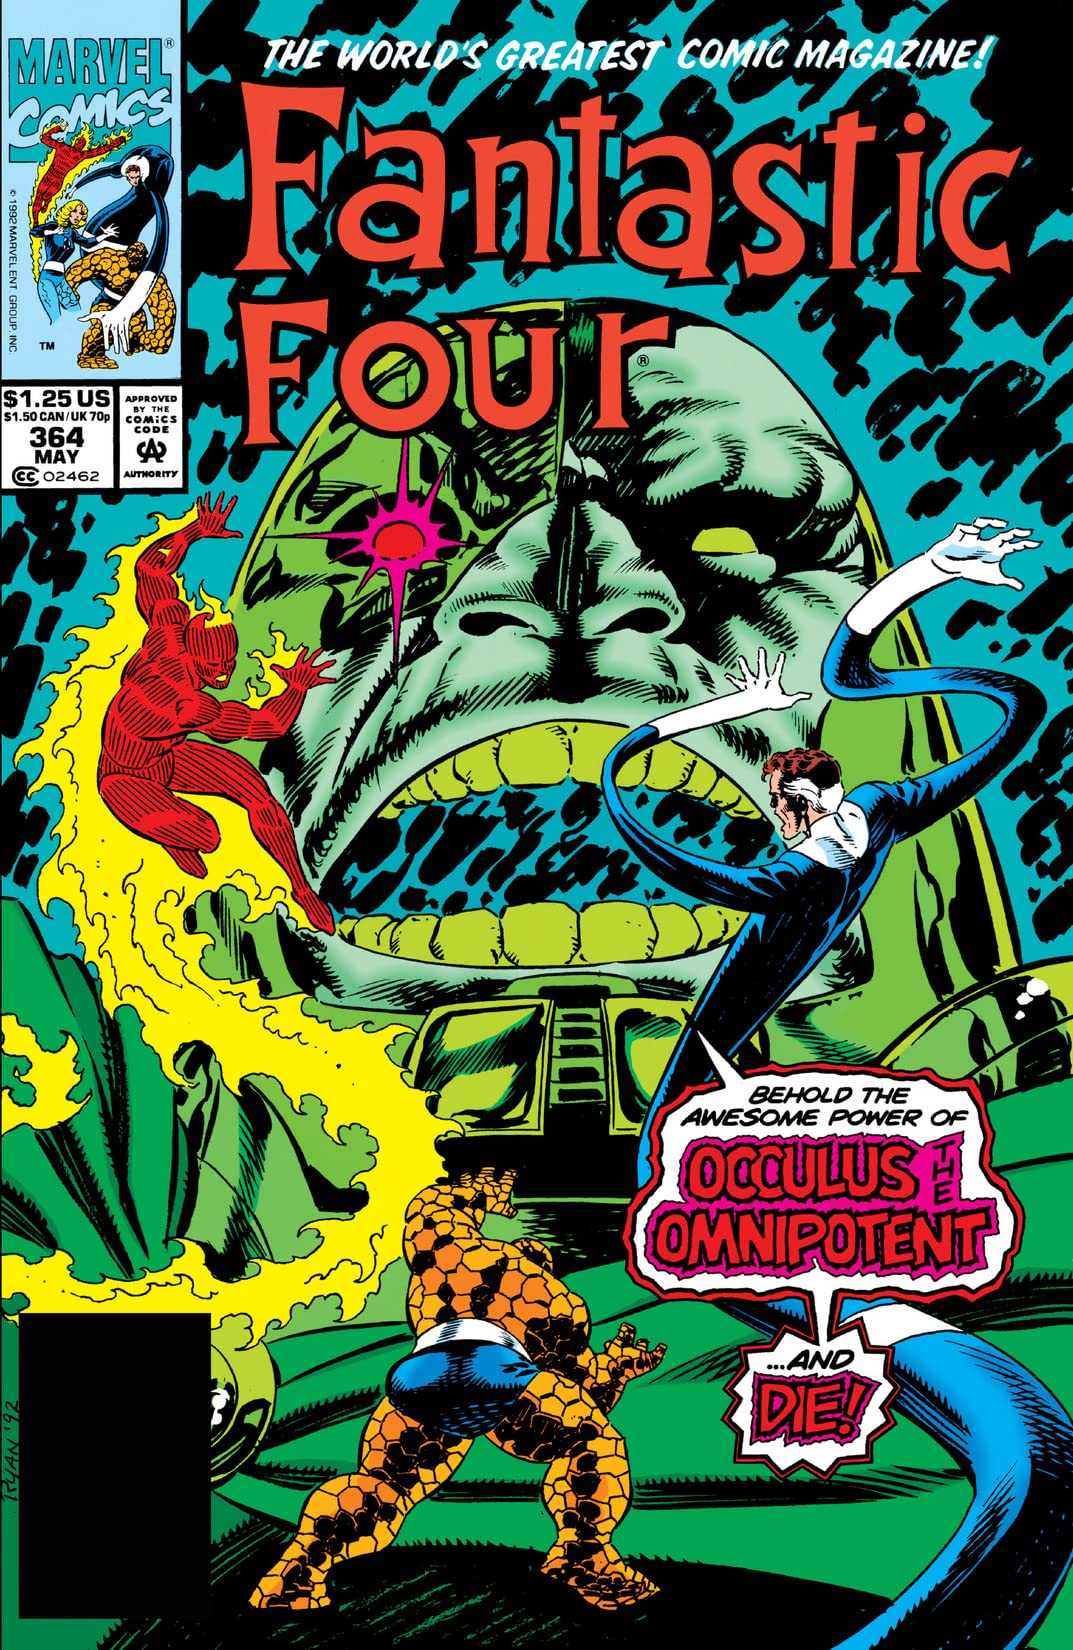 Fantastic Four (1961-1998) #364